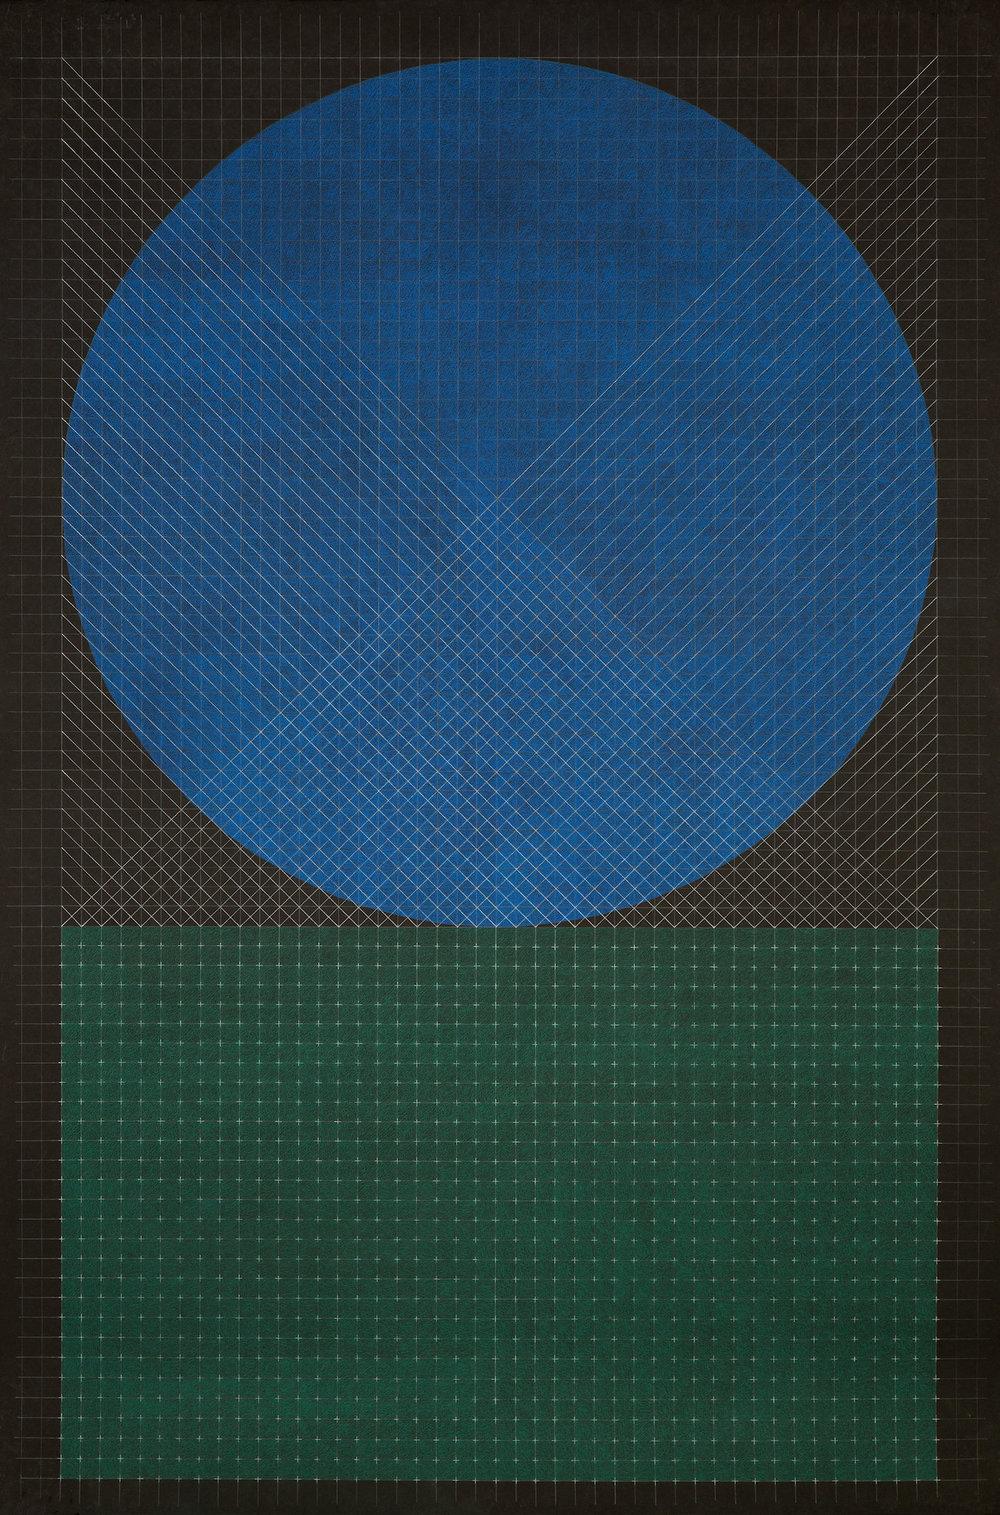 Fahd Burki  Untitled 1 2015 Pastel pencils on paper 154 cm x 101.5 cm